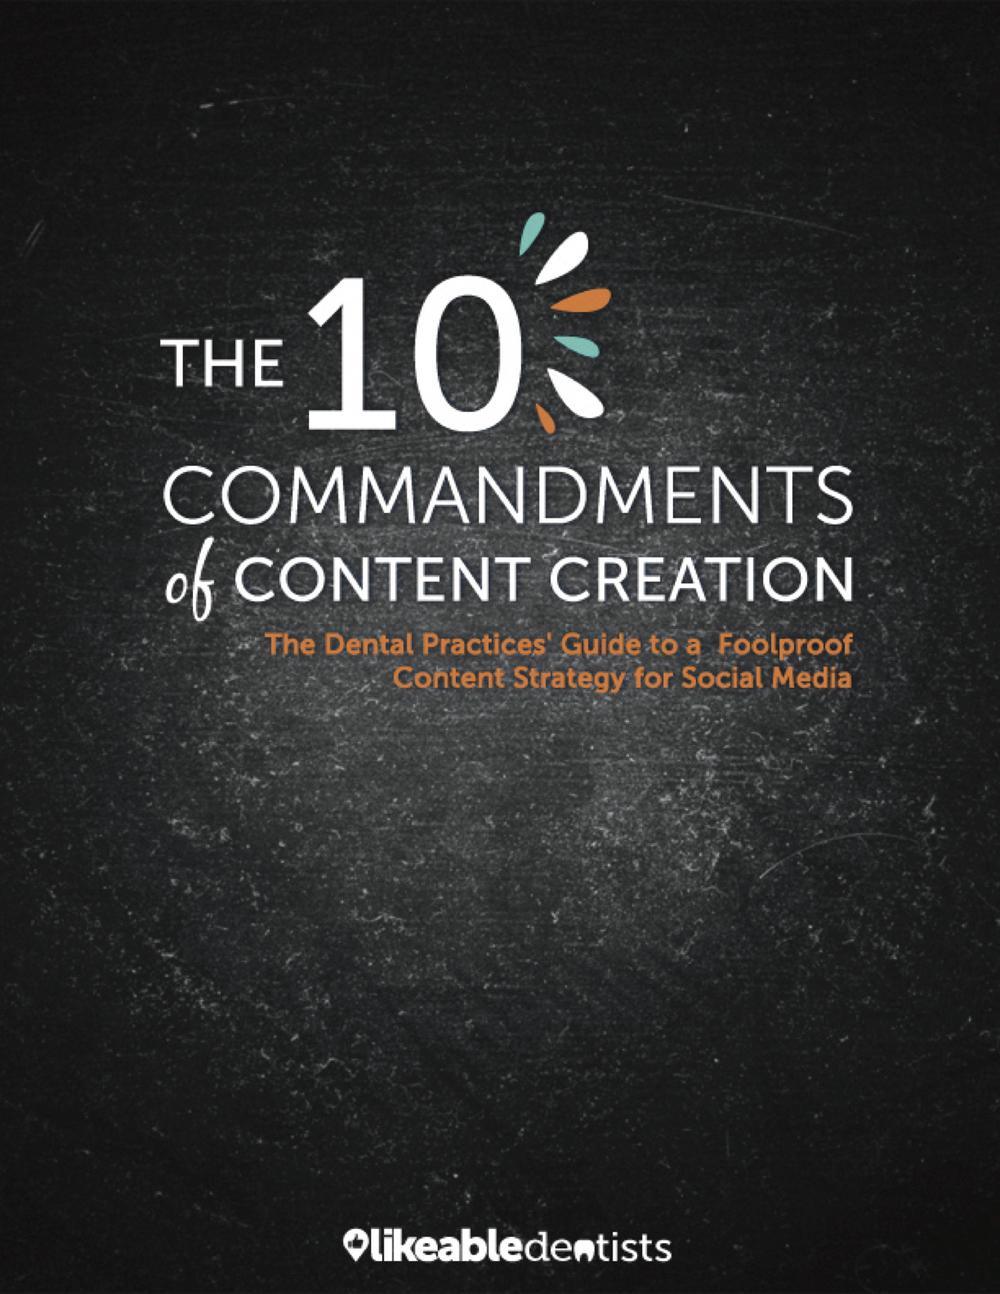 10Commandments_dentists.jpg